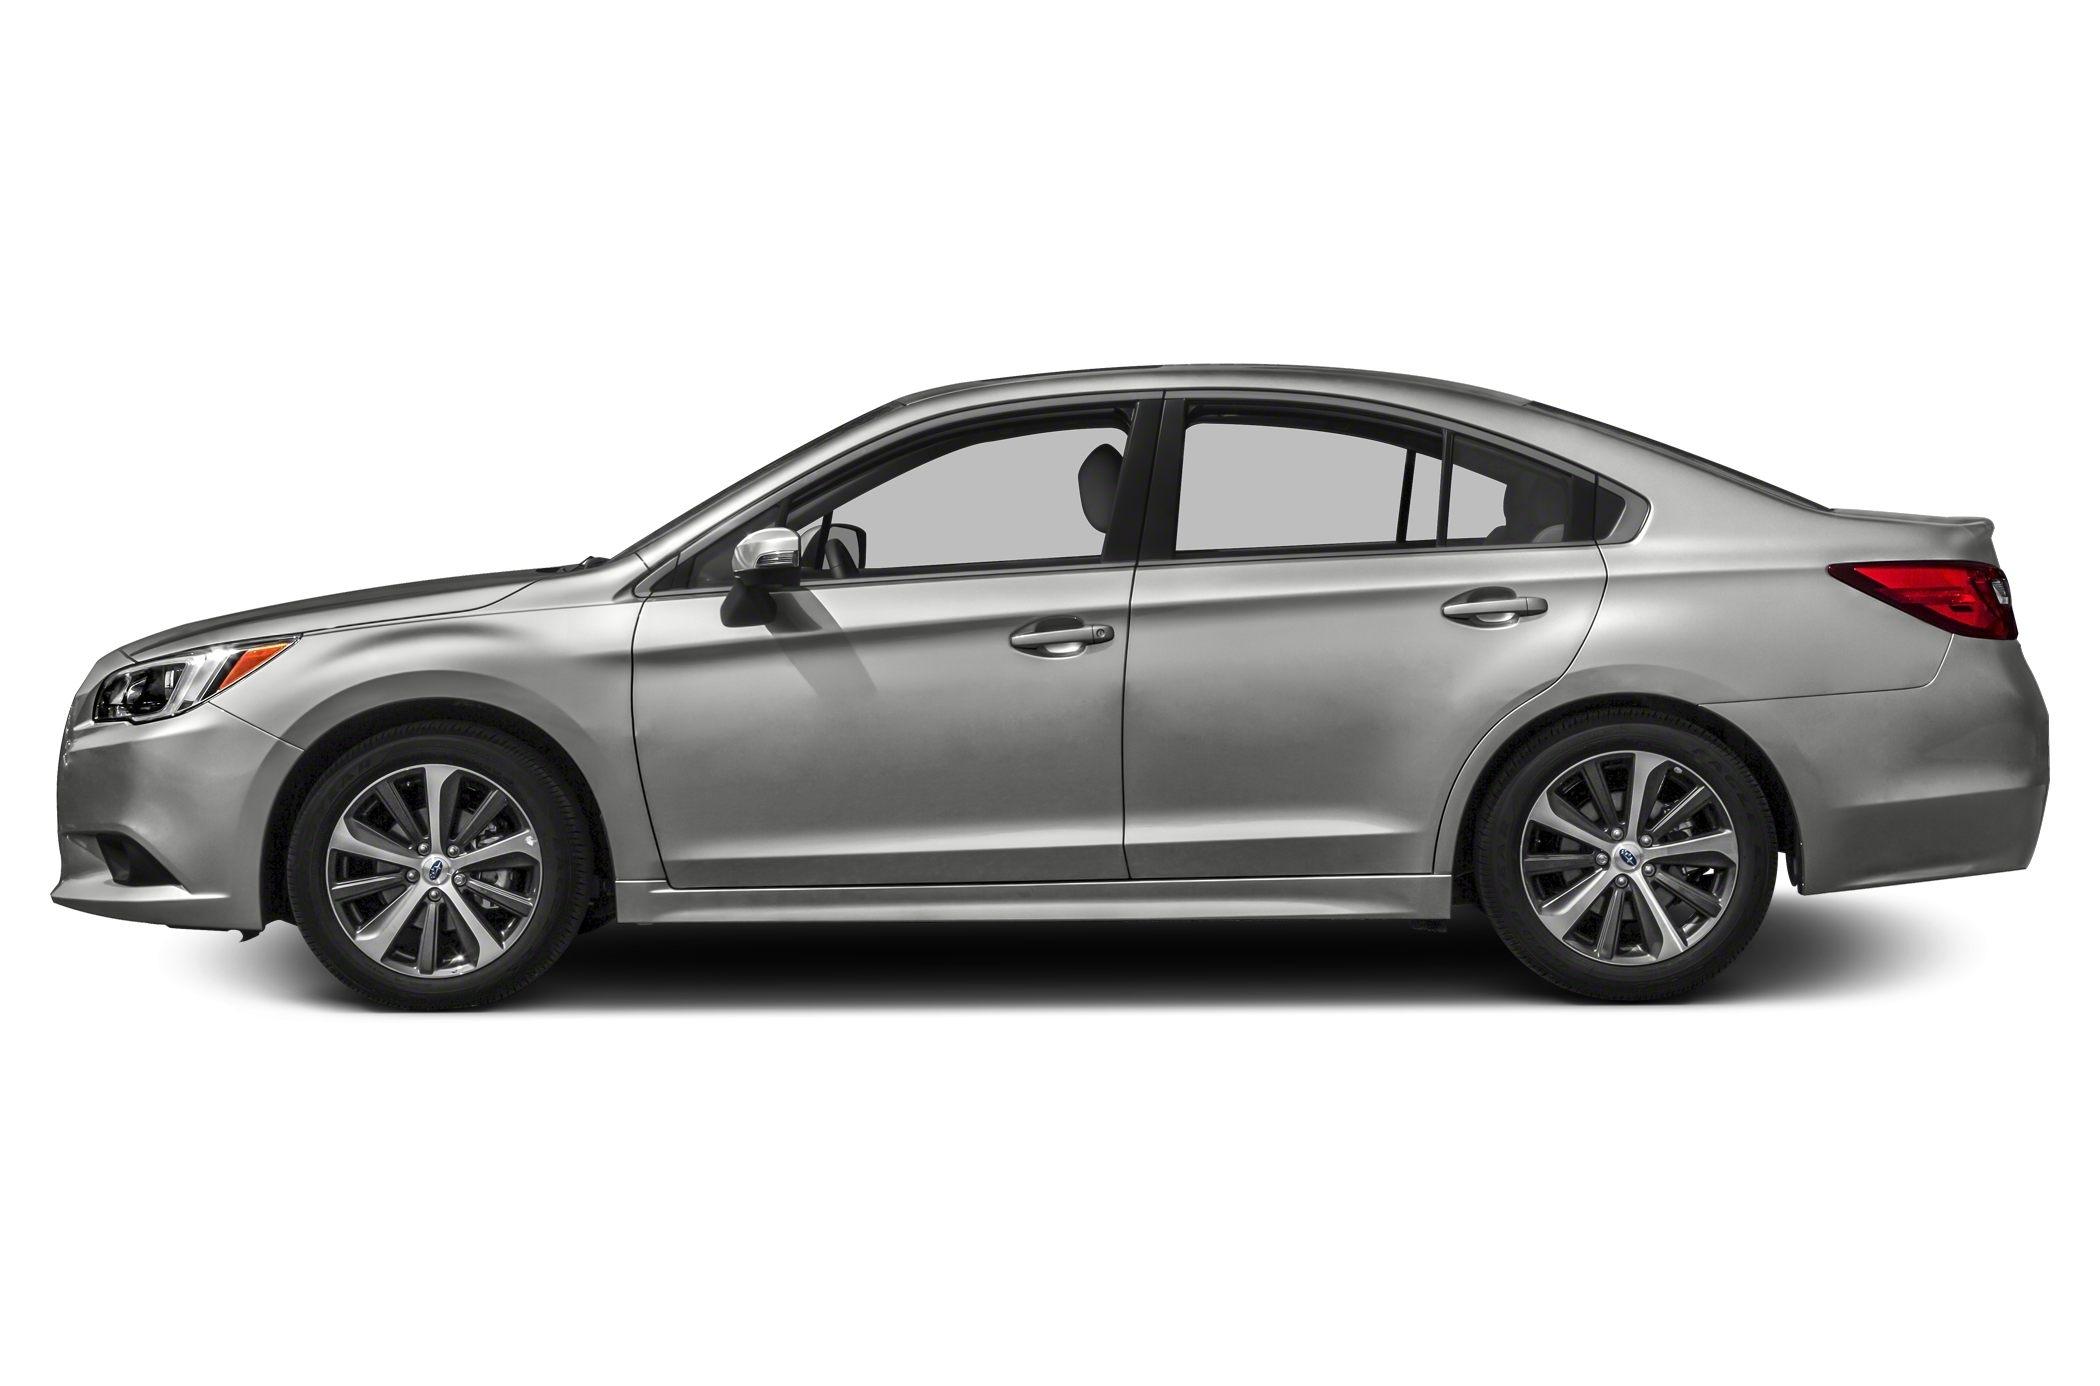 2015 Subaru Wrx Invoice 28 Pictures About 2015 Subaru